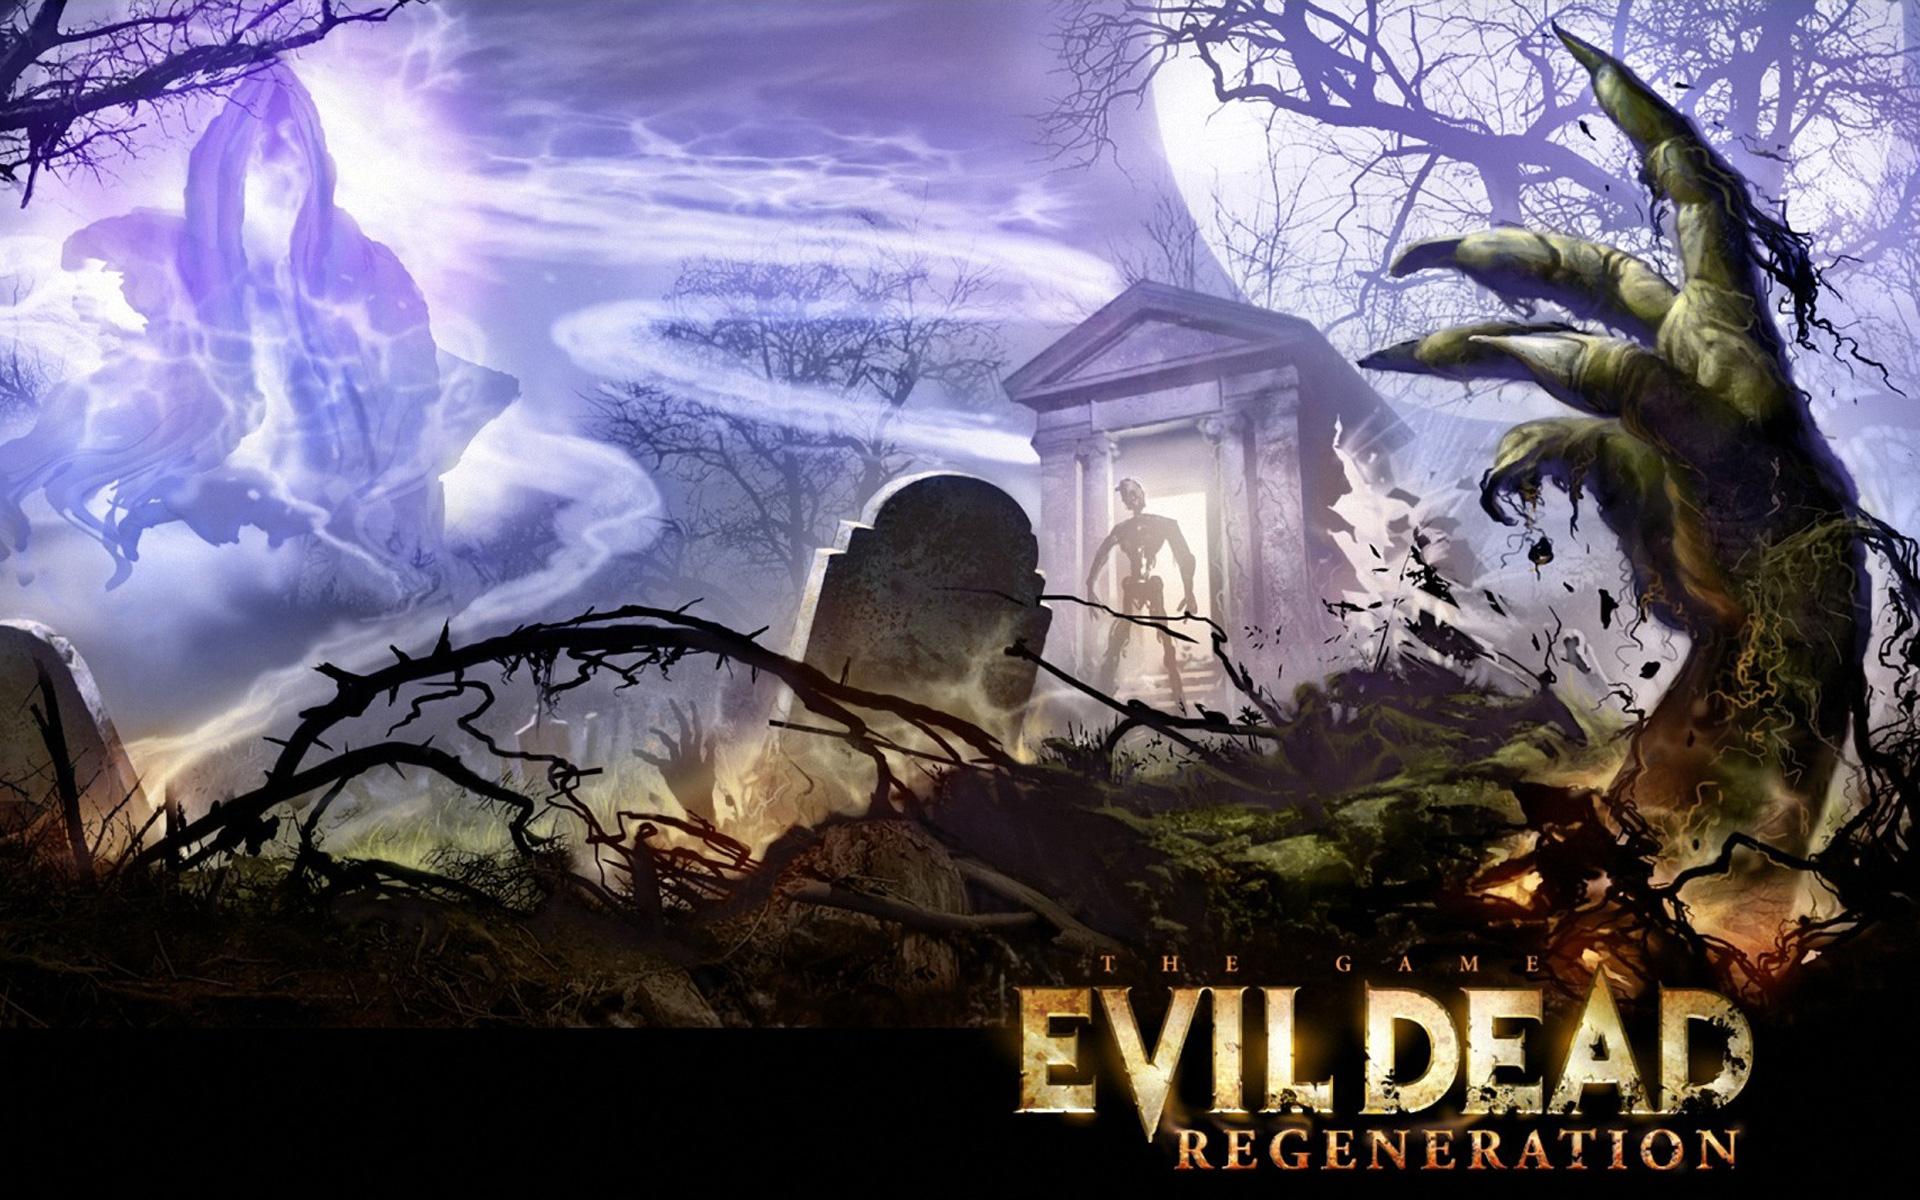 Evil Dead: Regeneration Wallpaper in 1920x1200